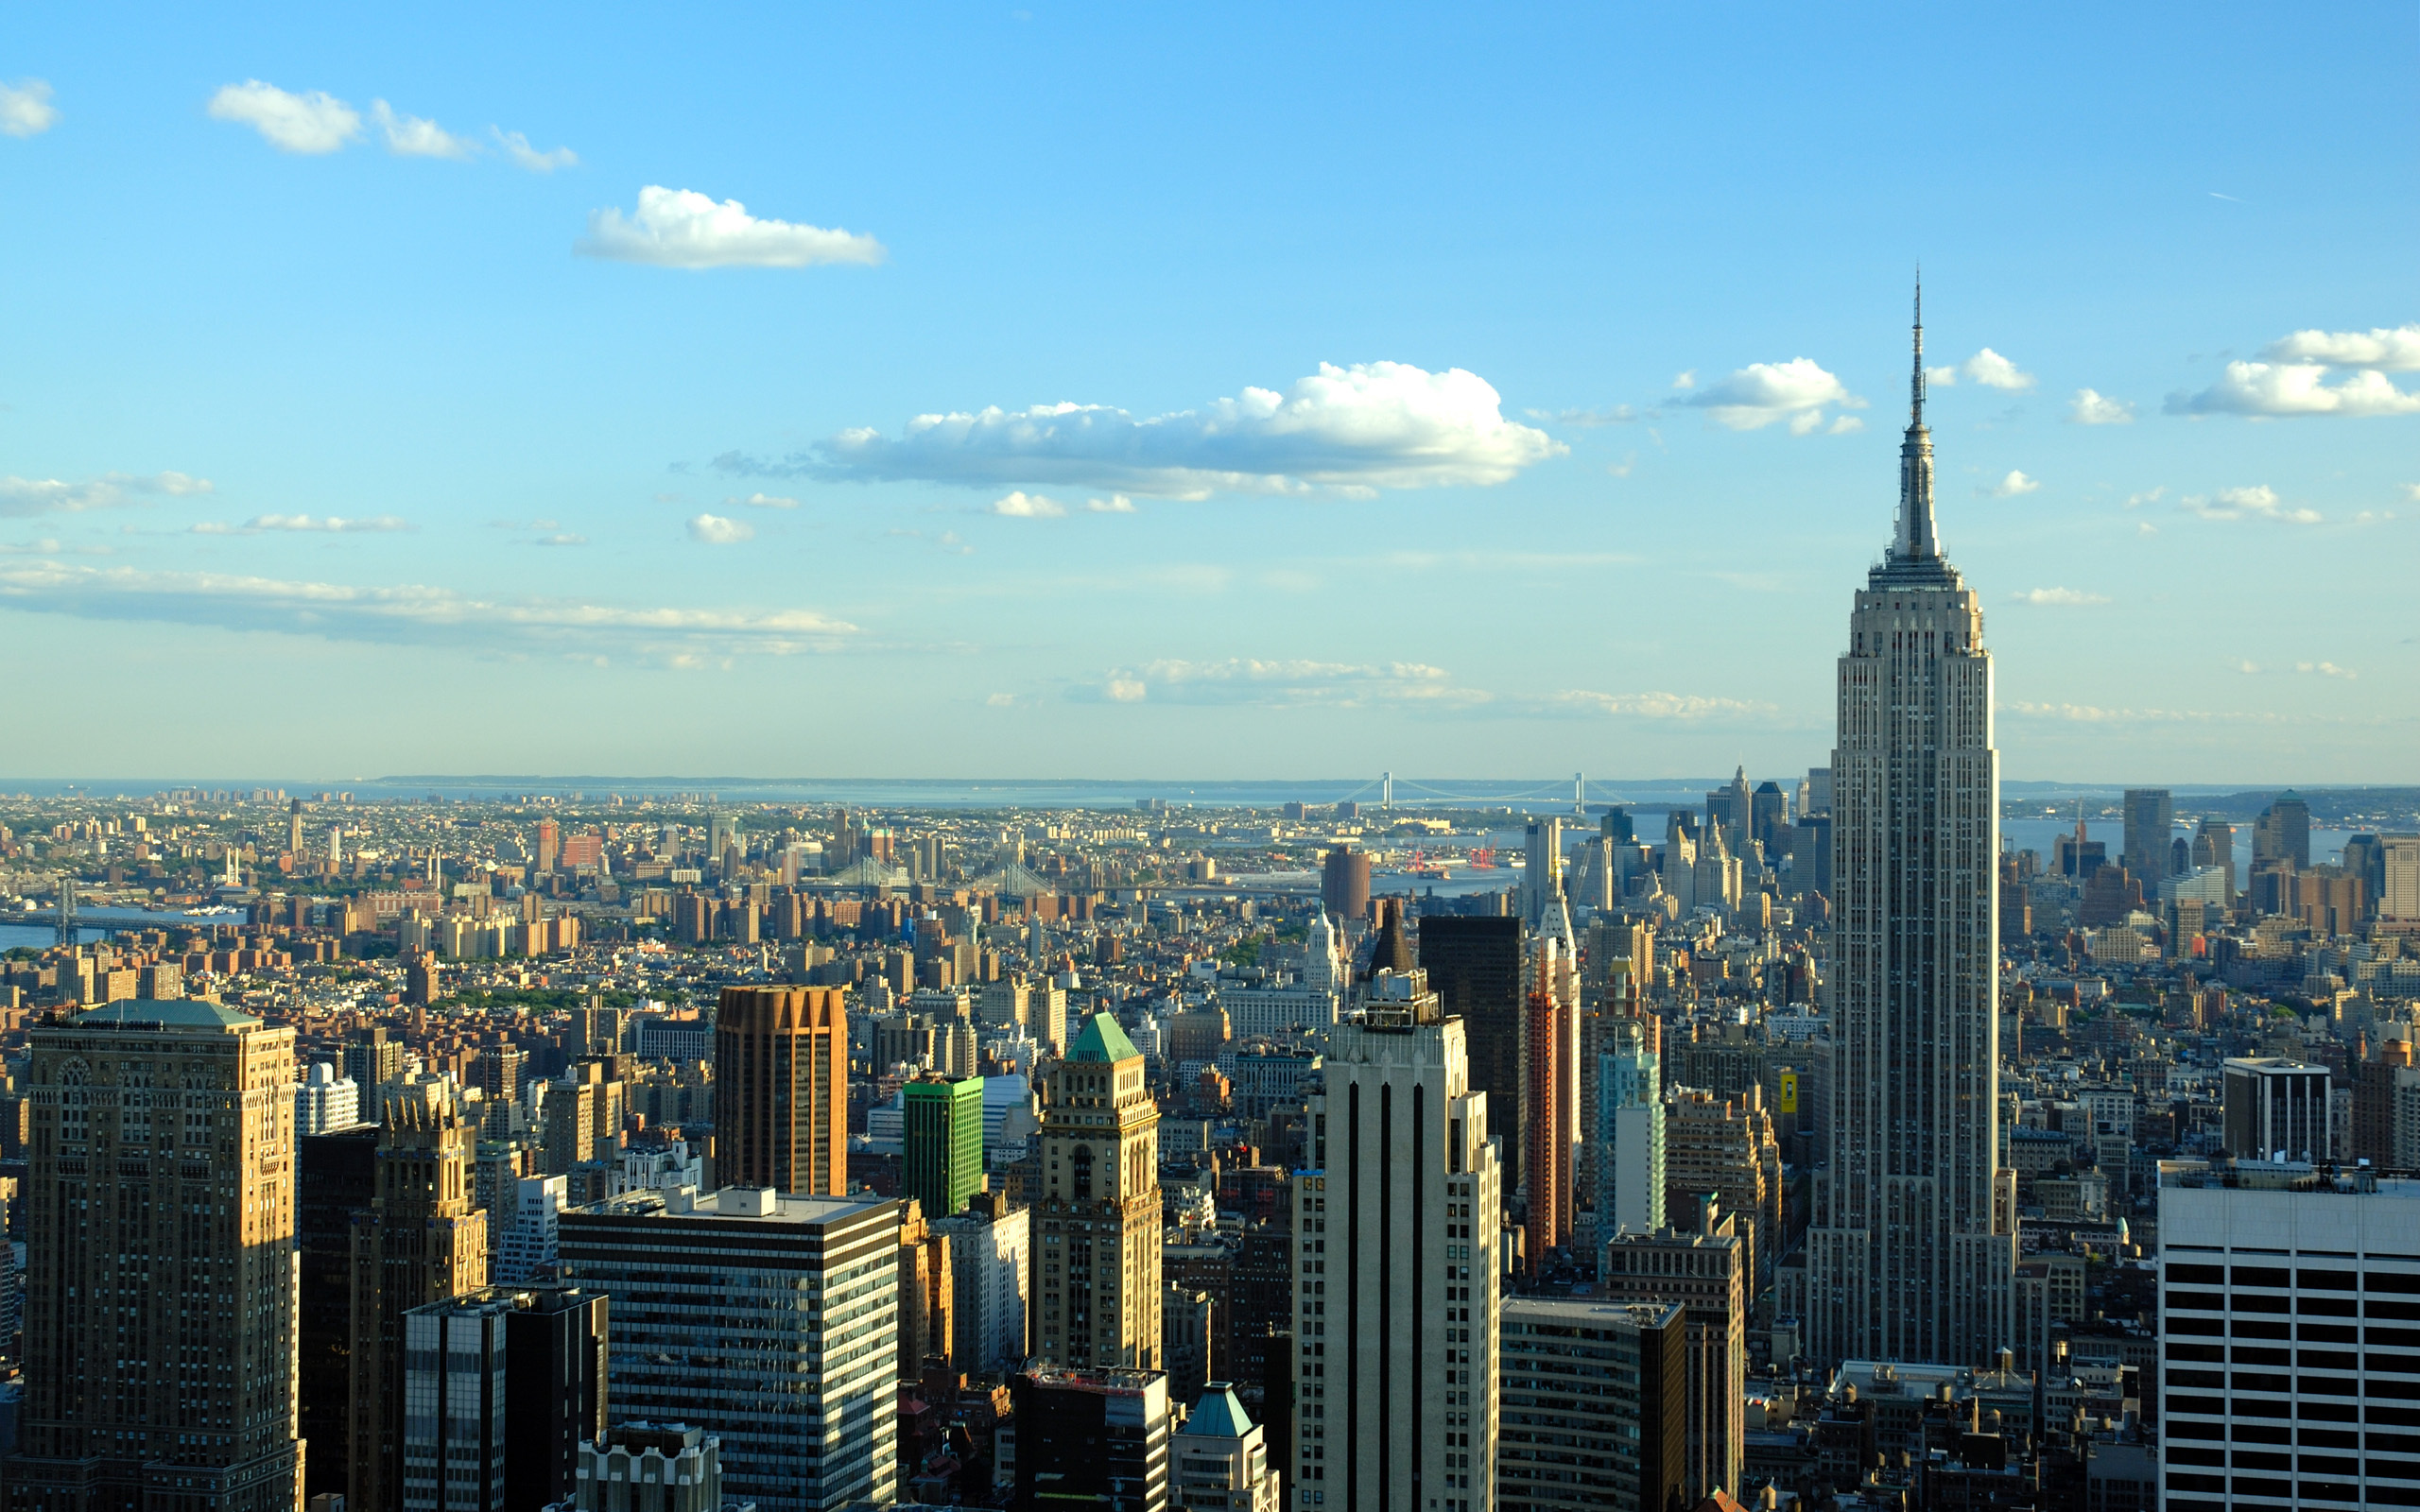 New York City Skyline Desktop Background in High Resolution at City 2560x1600